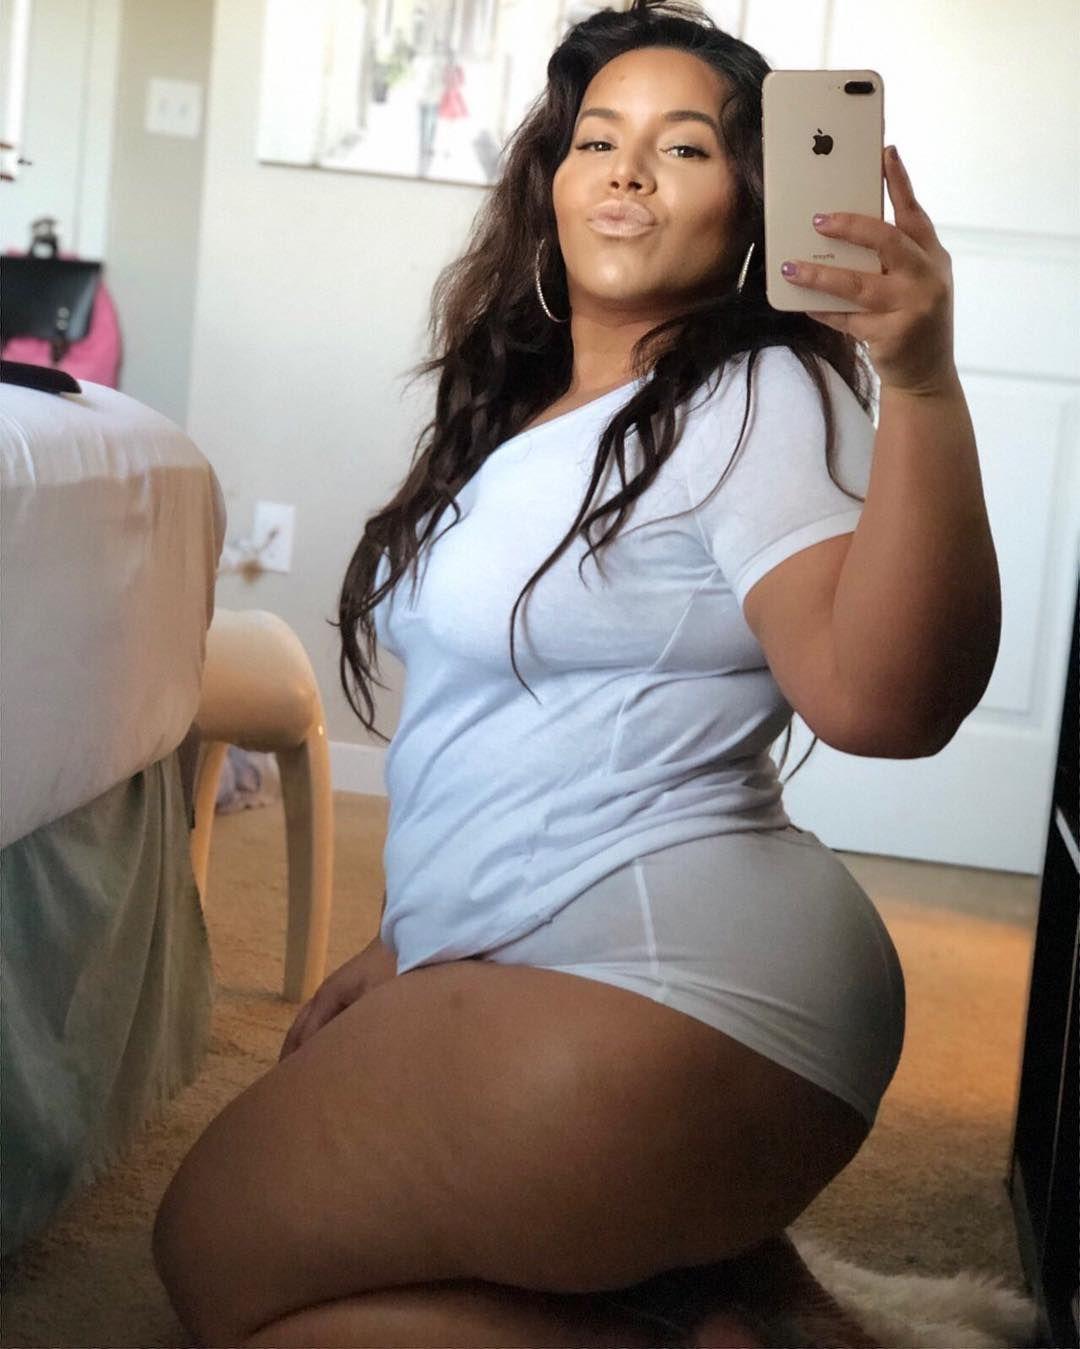 Homemade Chubby Latina Teen